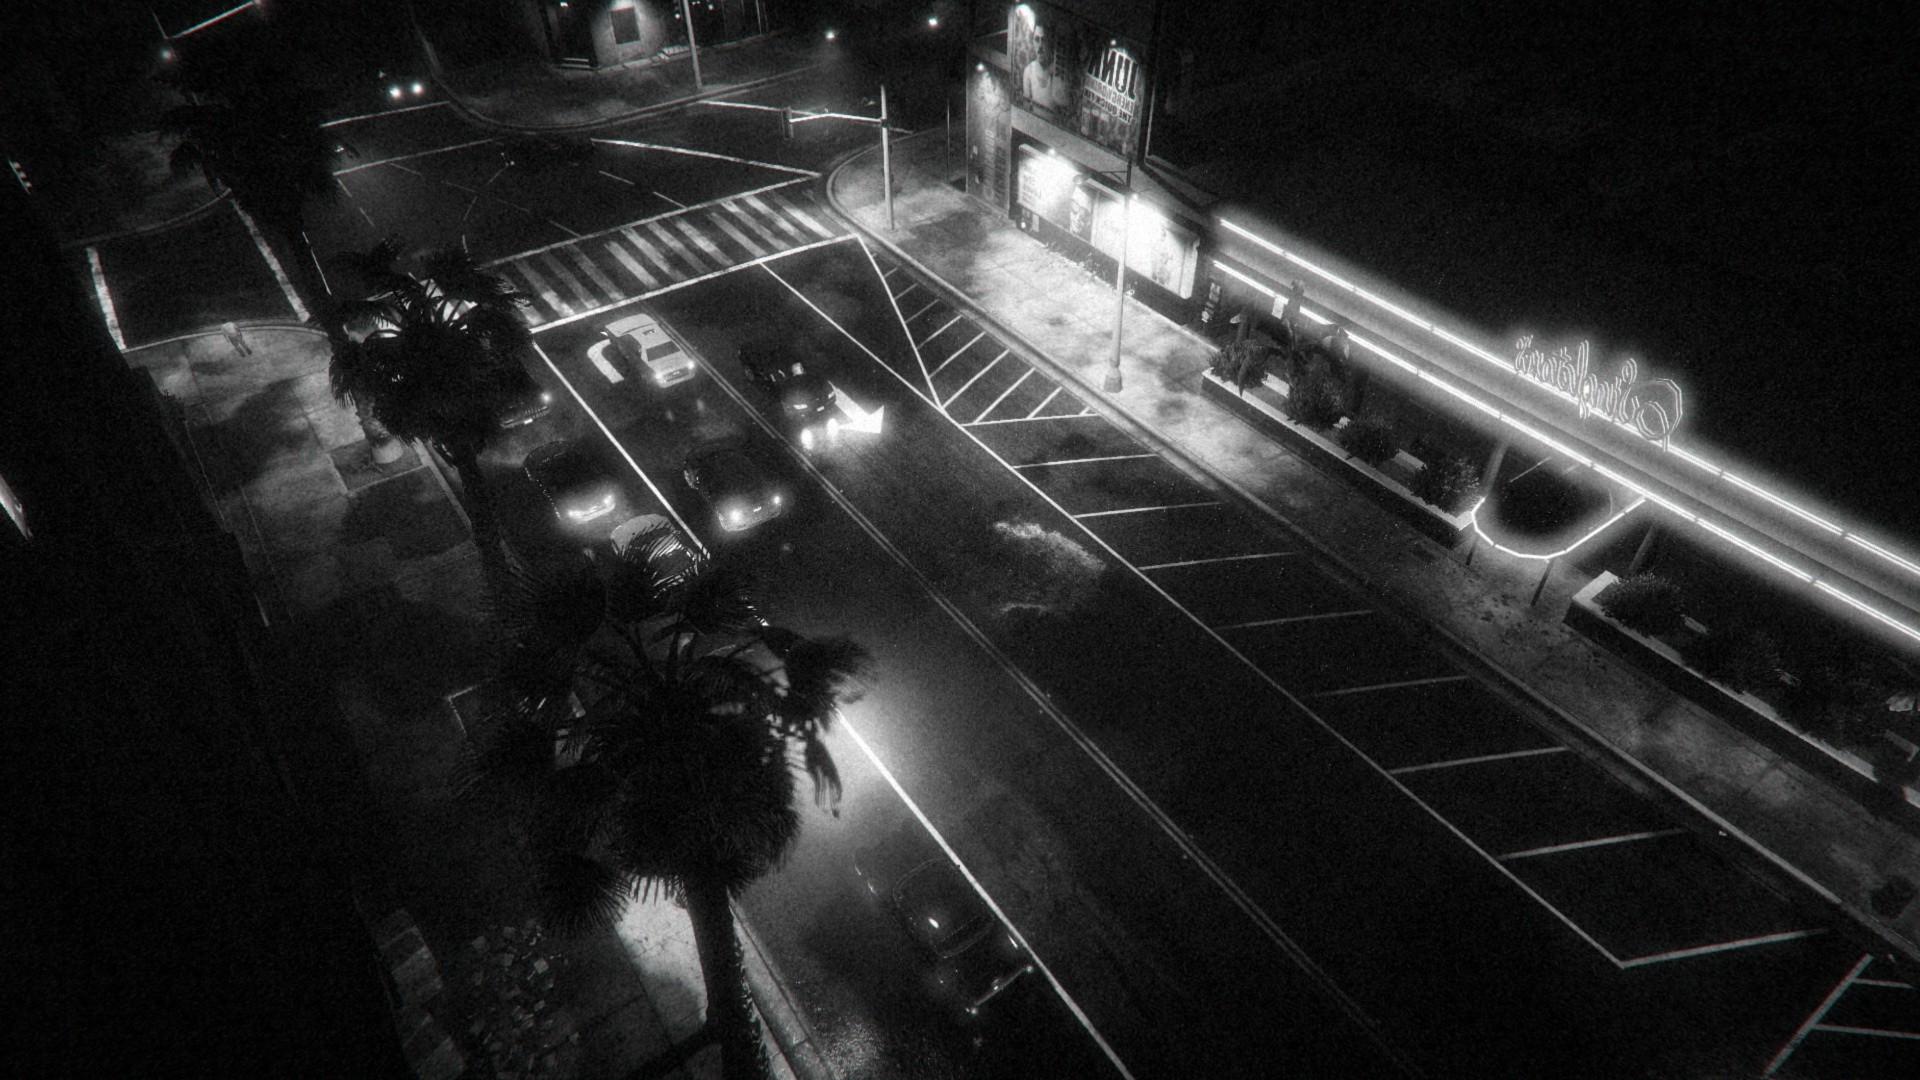 White black monochrome night vehicle grand theft auto v pc gaming rockstar games light lighting shape